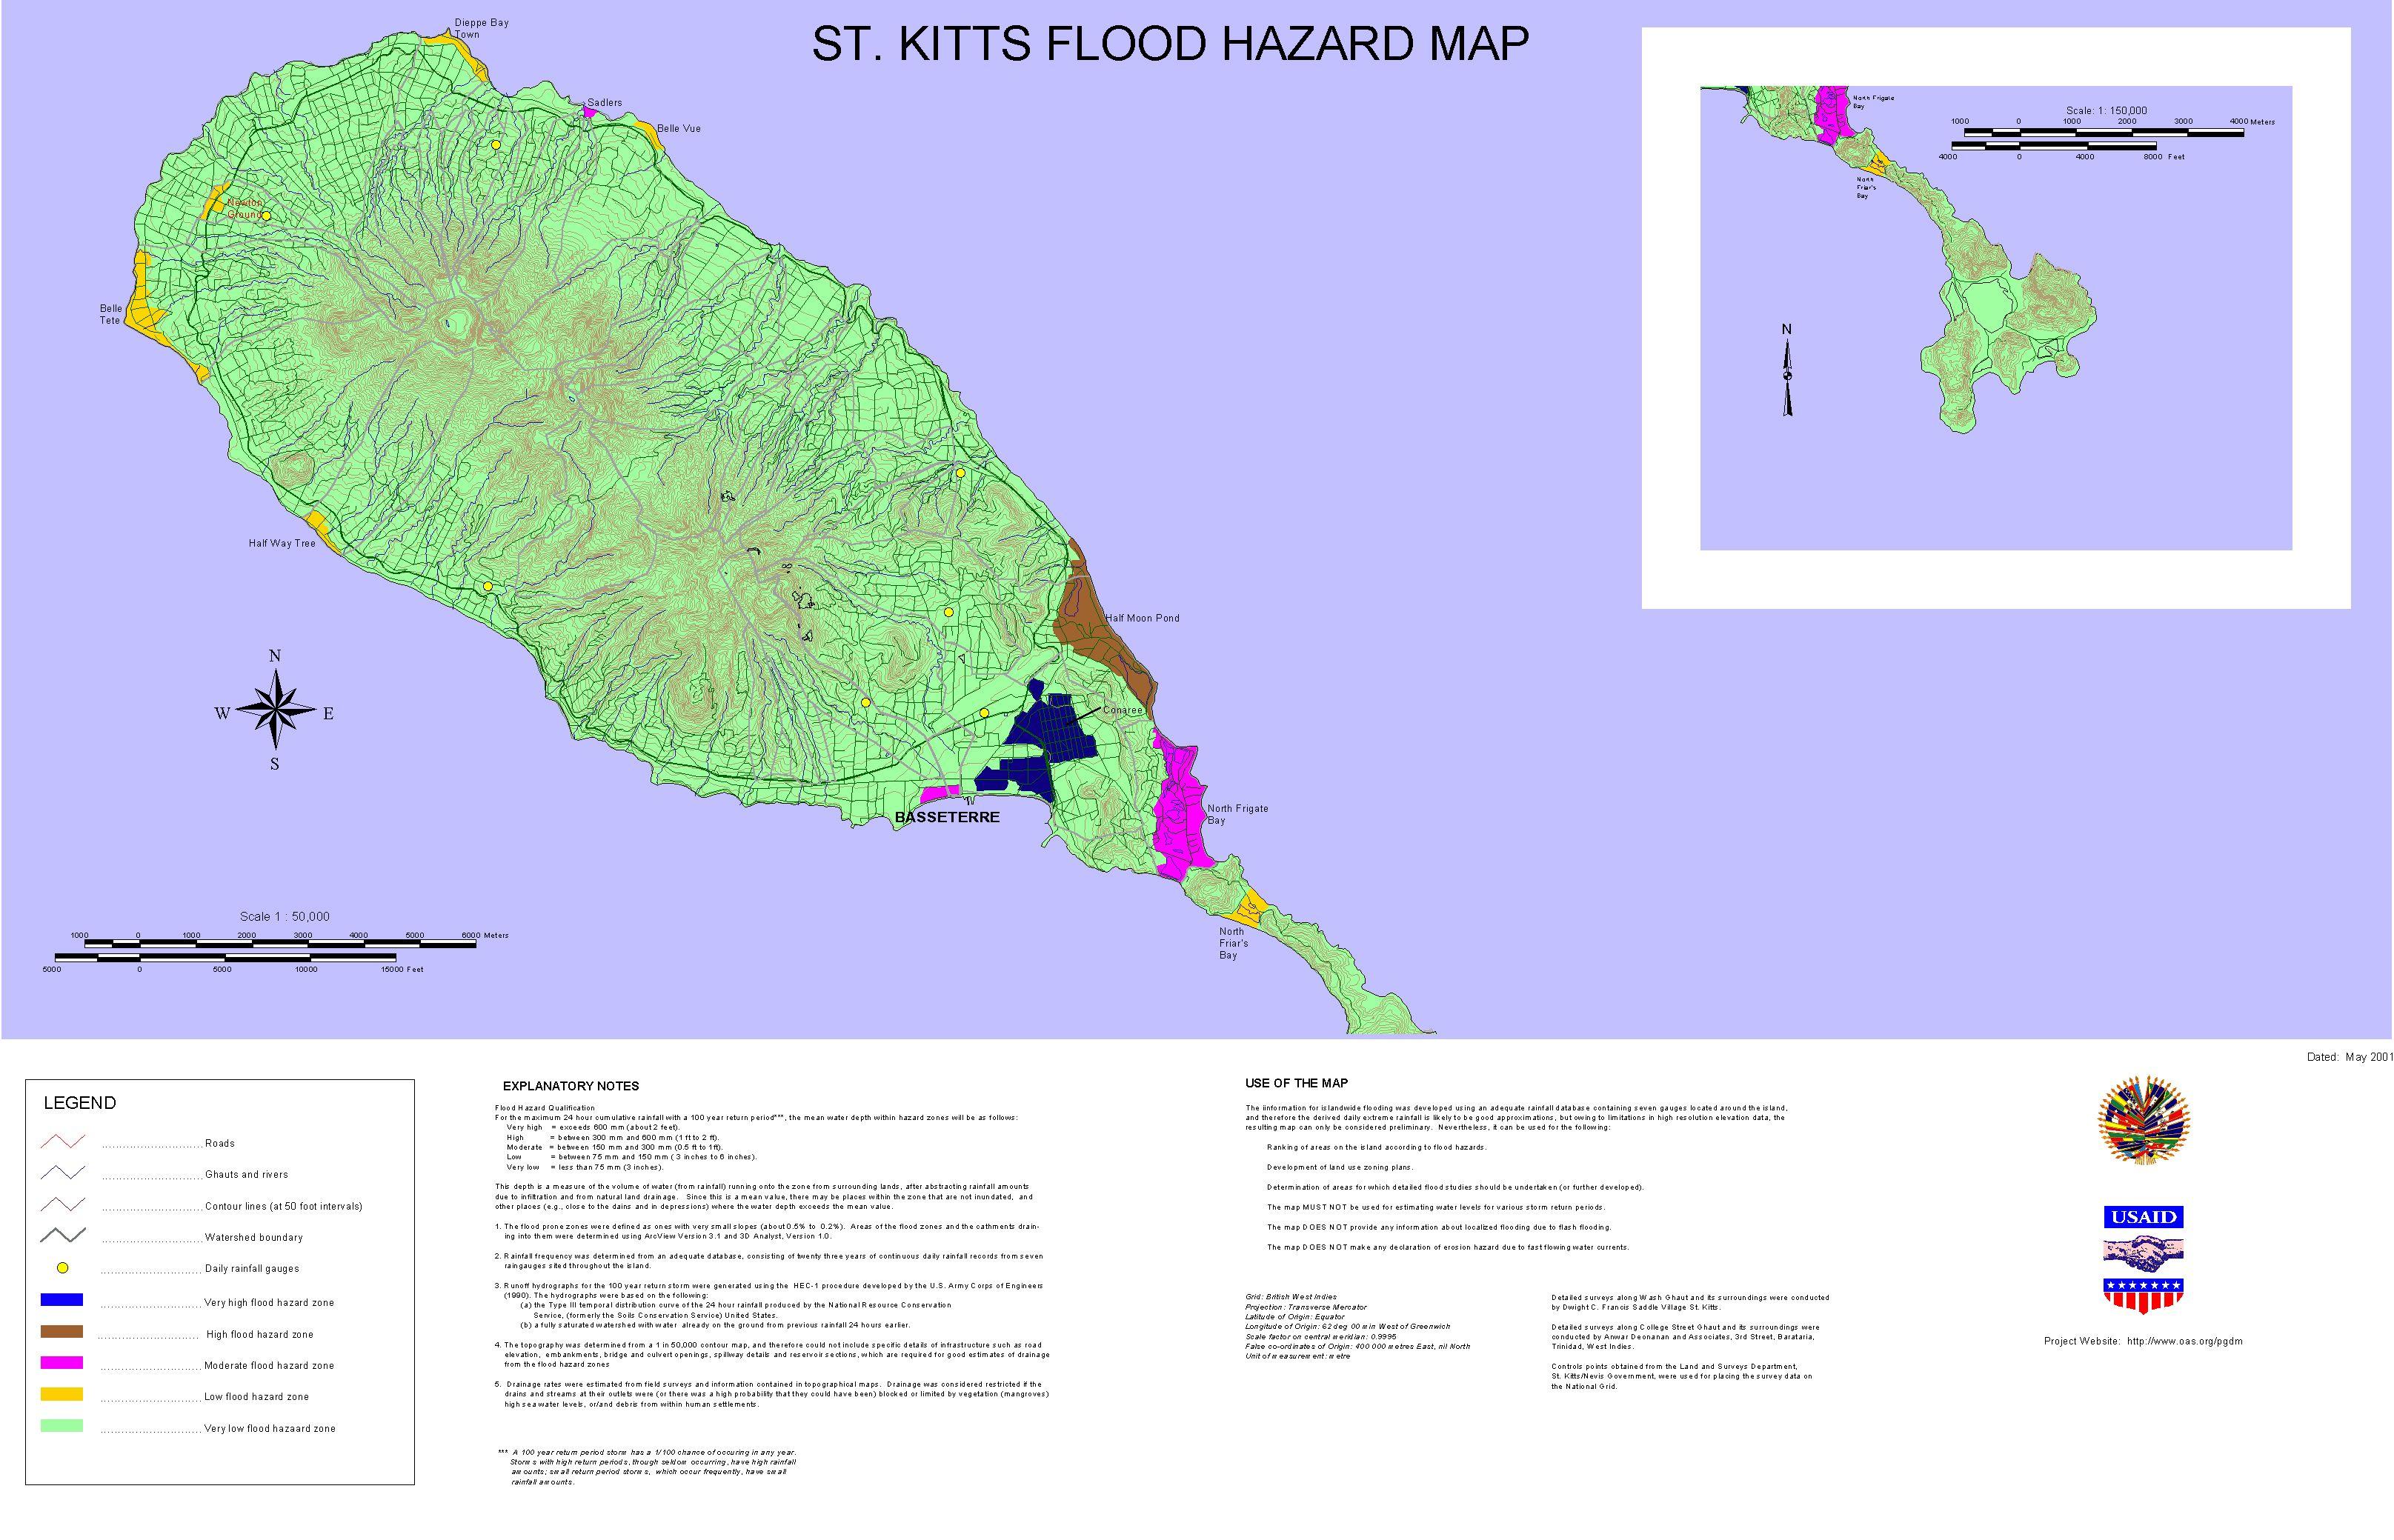 PGDM Inland Flooding Hazard Map St Kitts